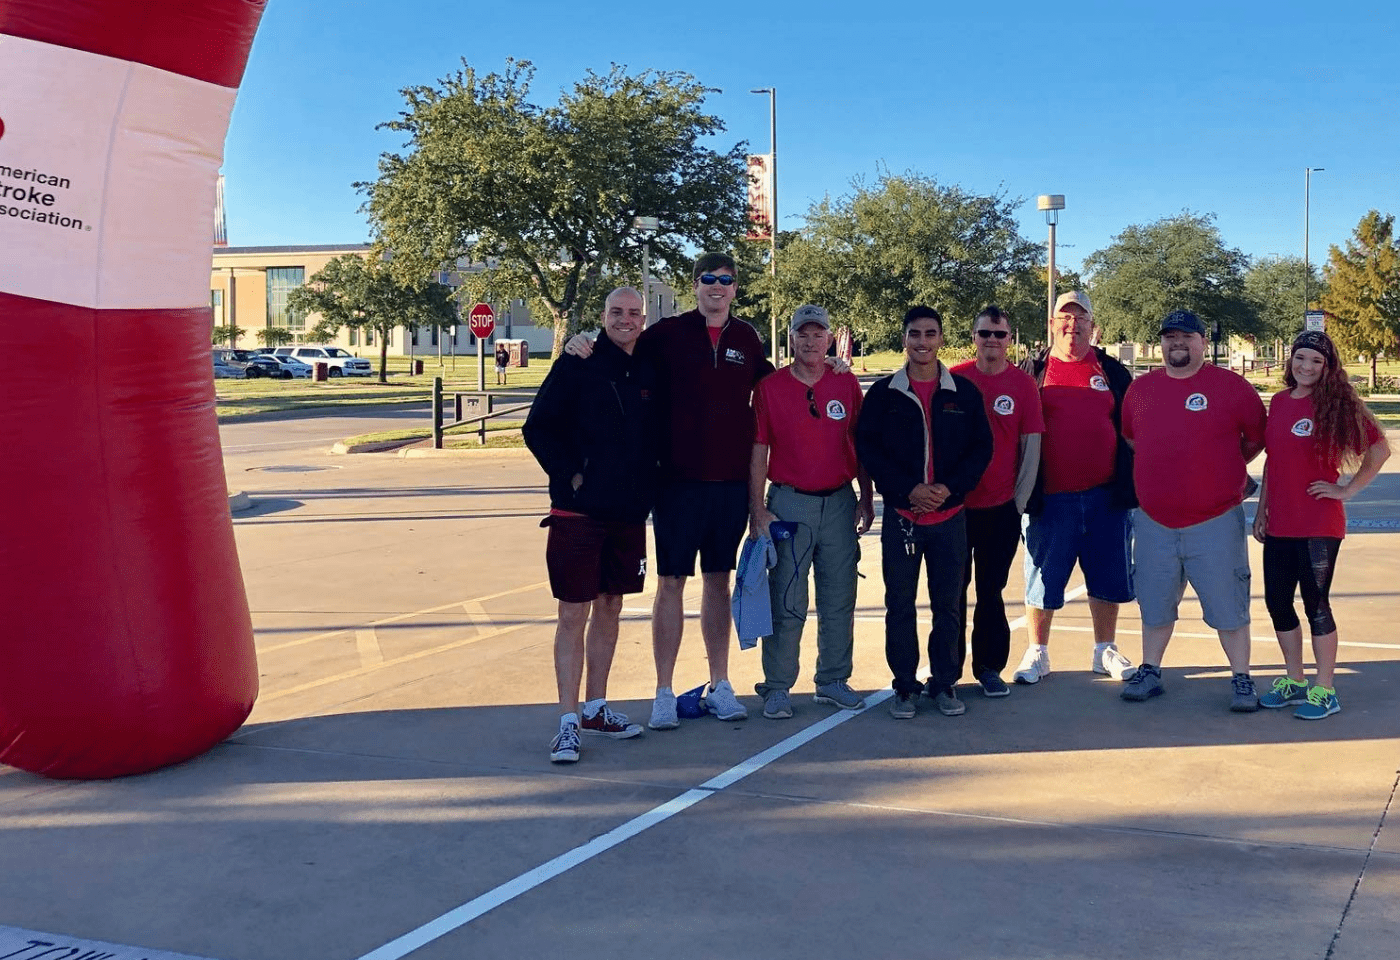 ABC team members at the American Heart Association Walk